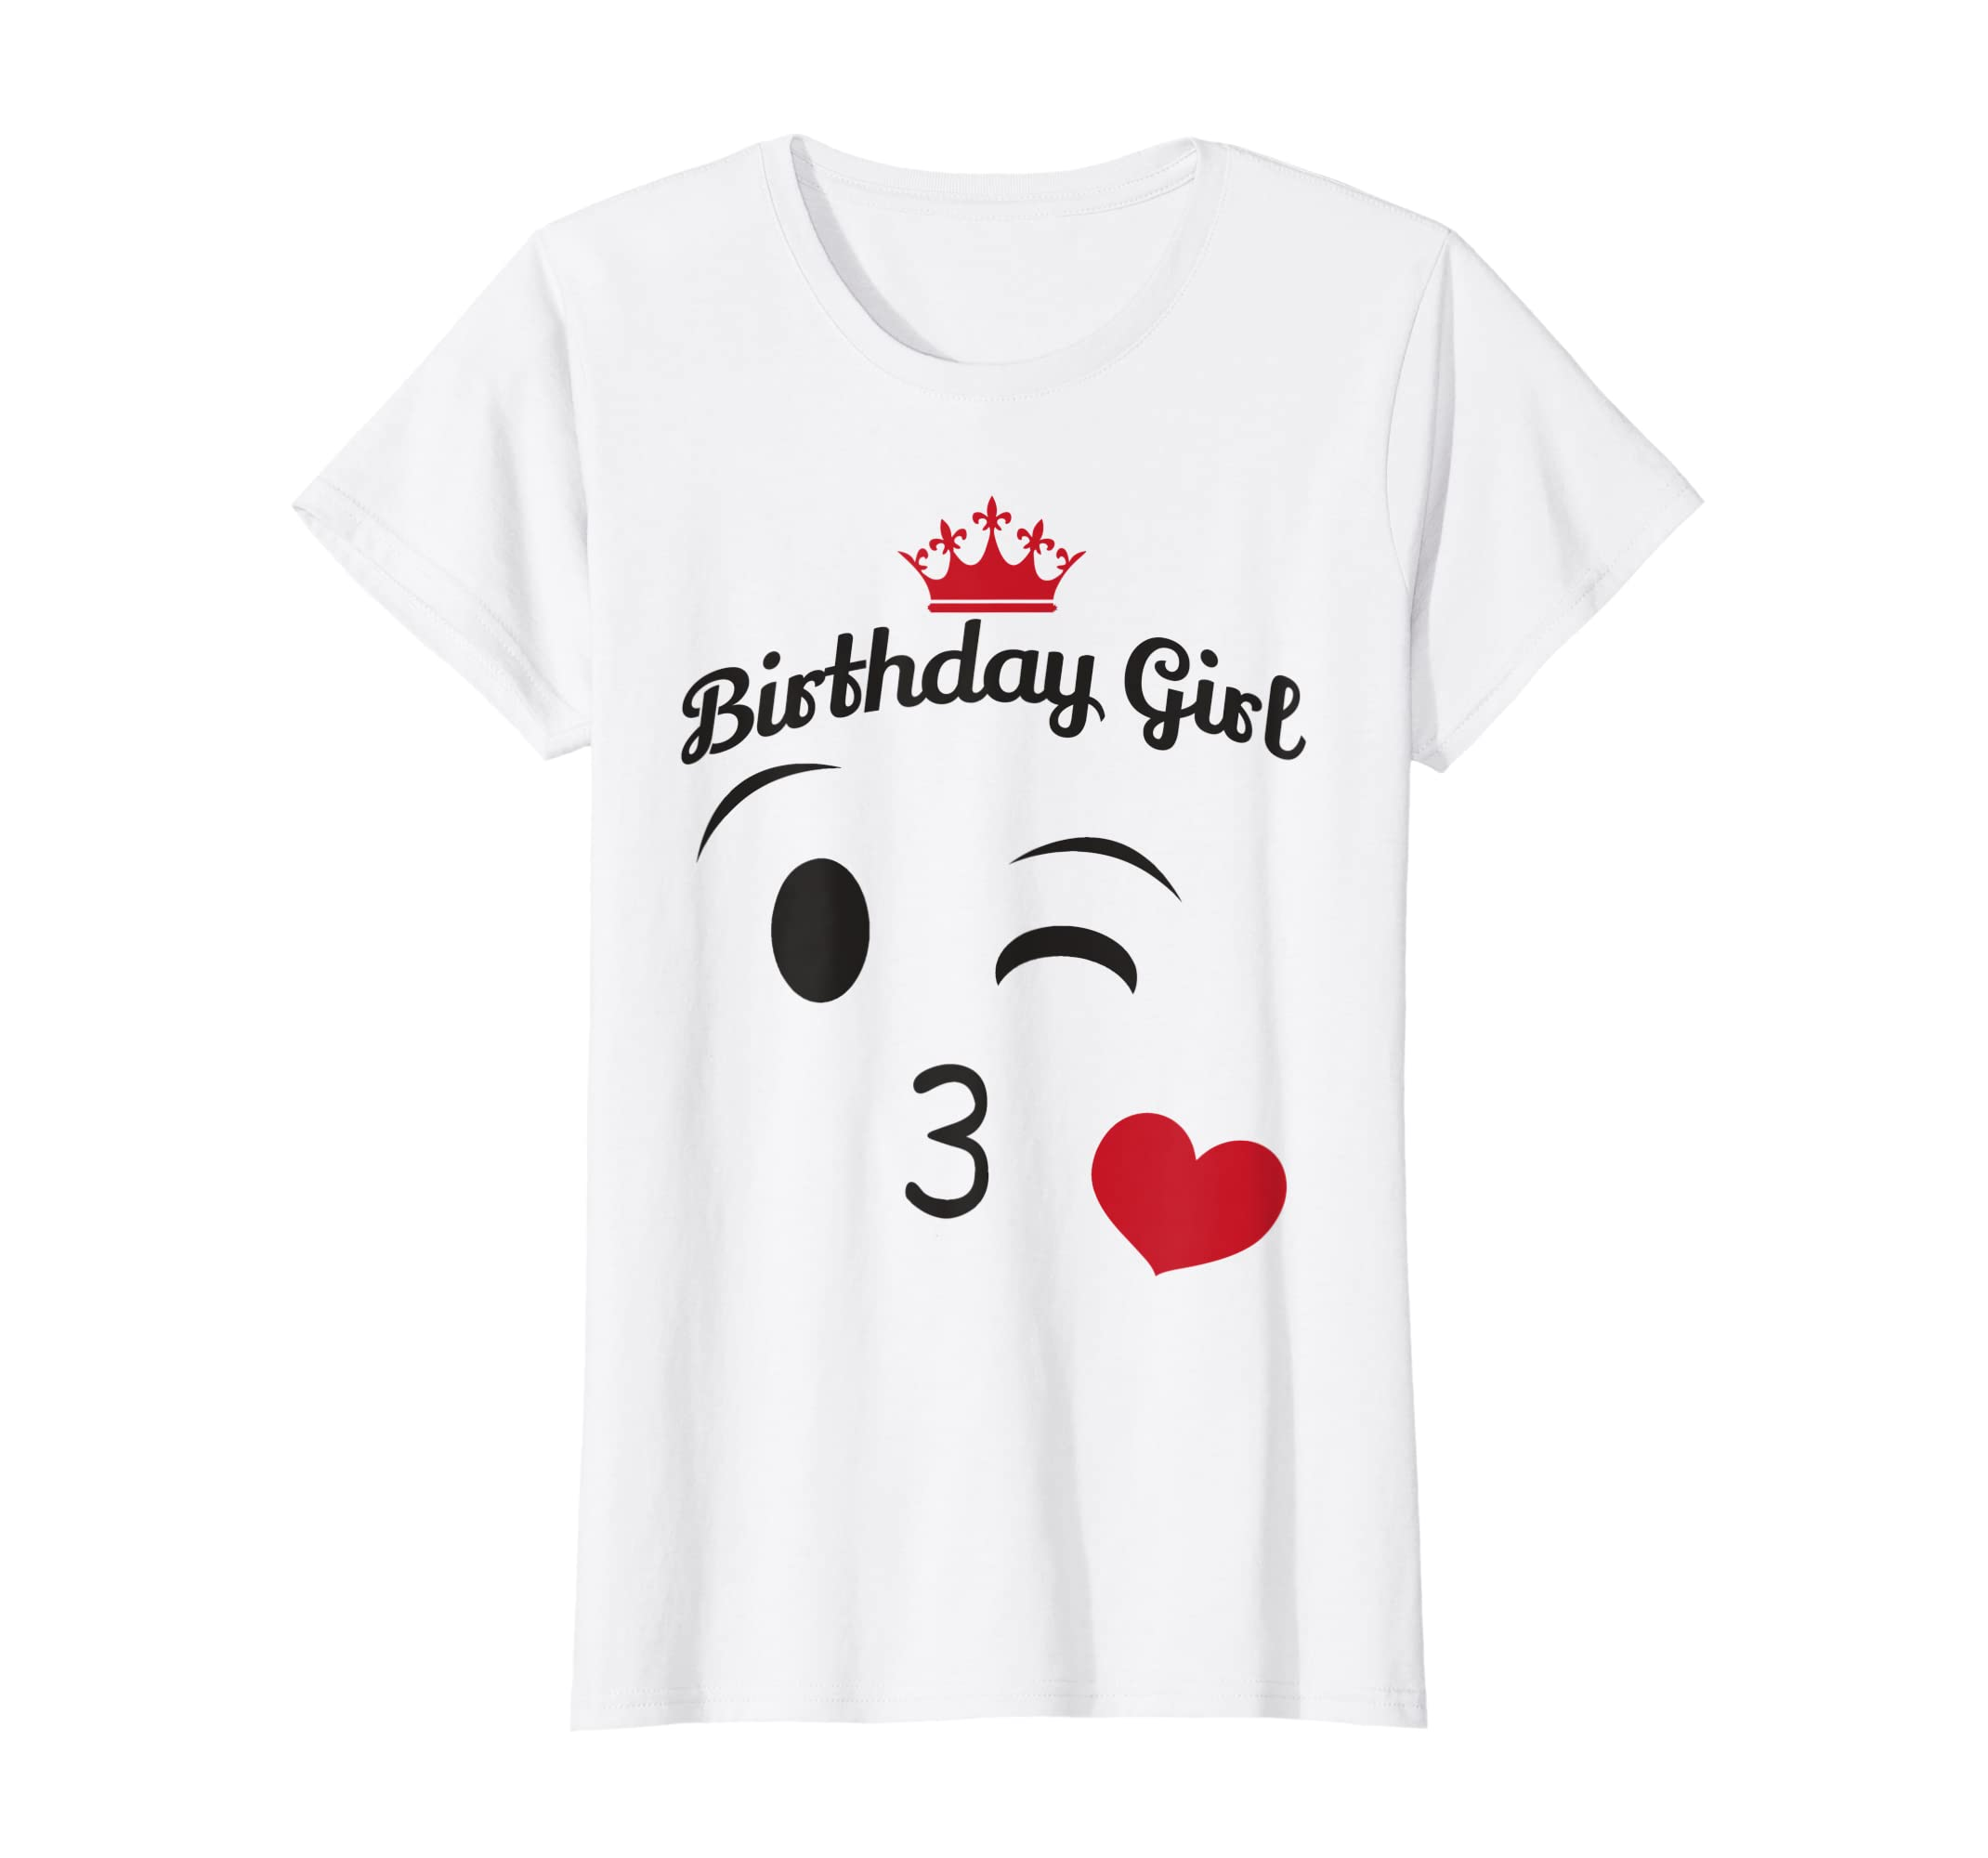 Amazon Emoji Birthday Shirt Girl Wink Heart Kiss Tee Clothing